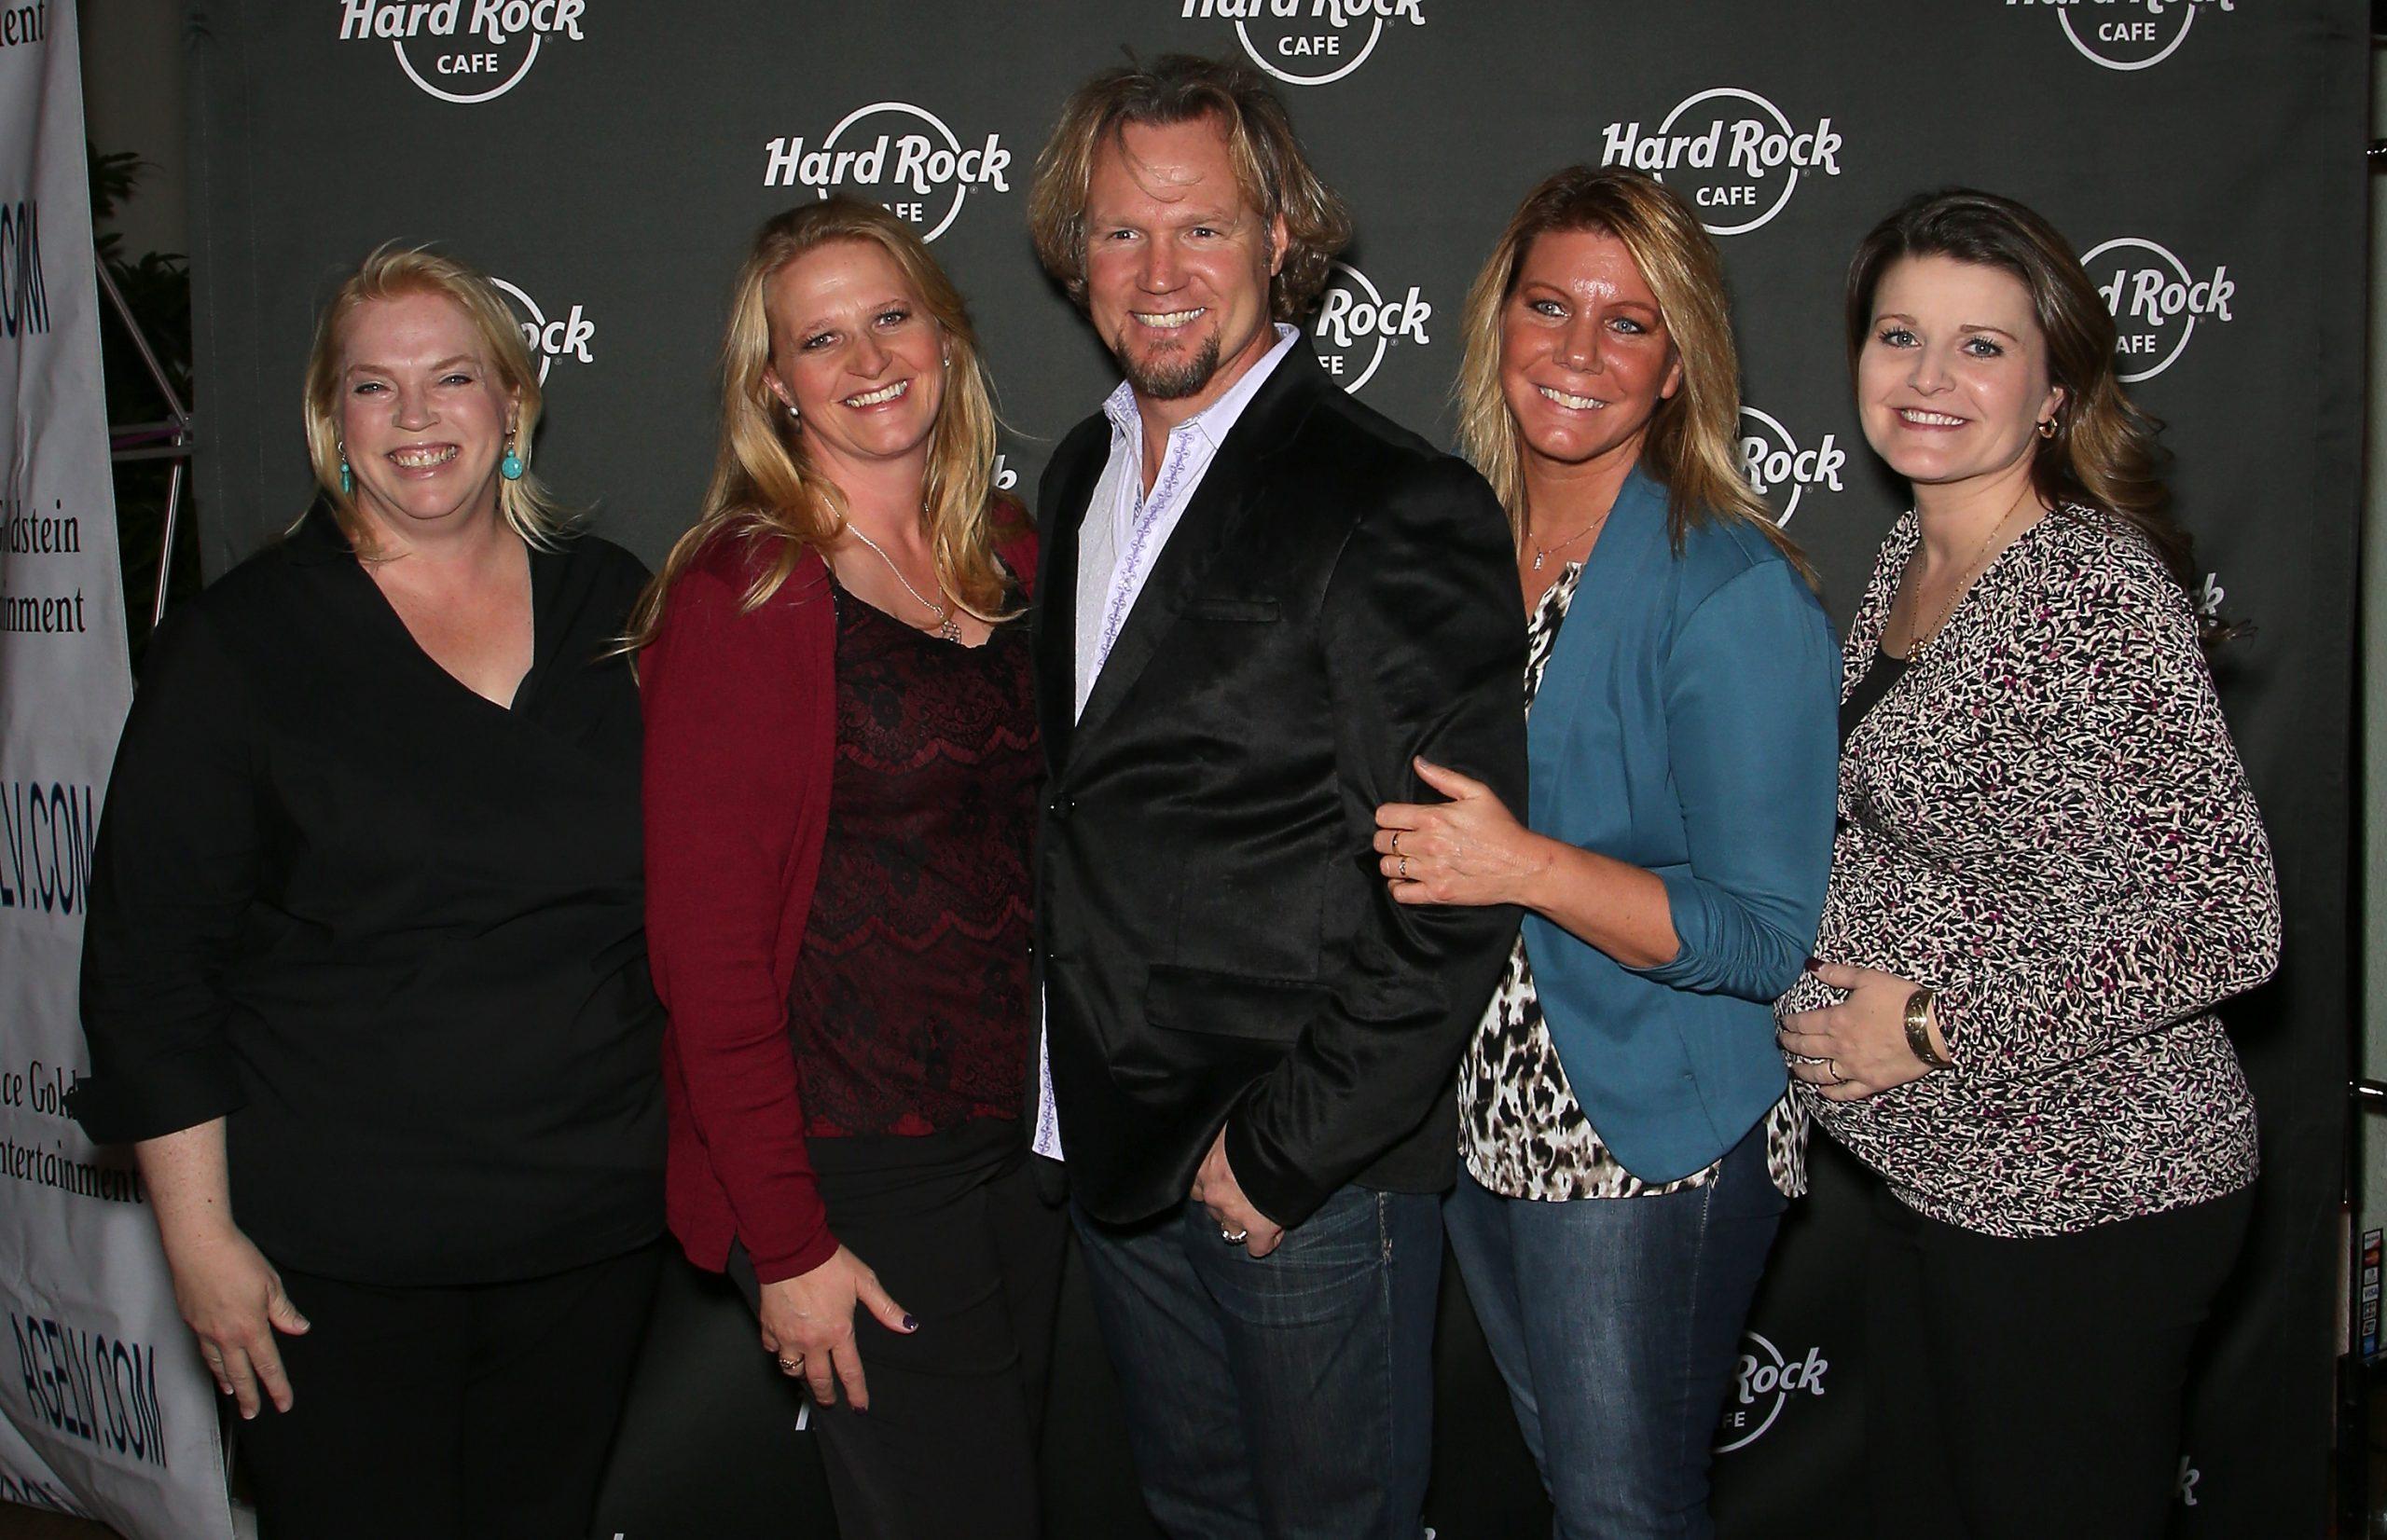 Kody Brown (C) and (L-R) Janelle Brown, Christine Brown, Meri Brown, and Robyn Brown of Sister Wives